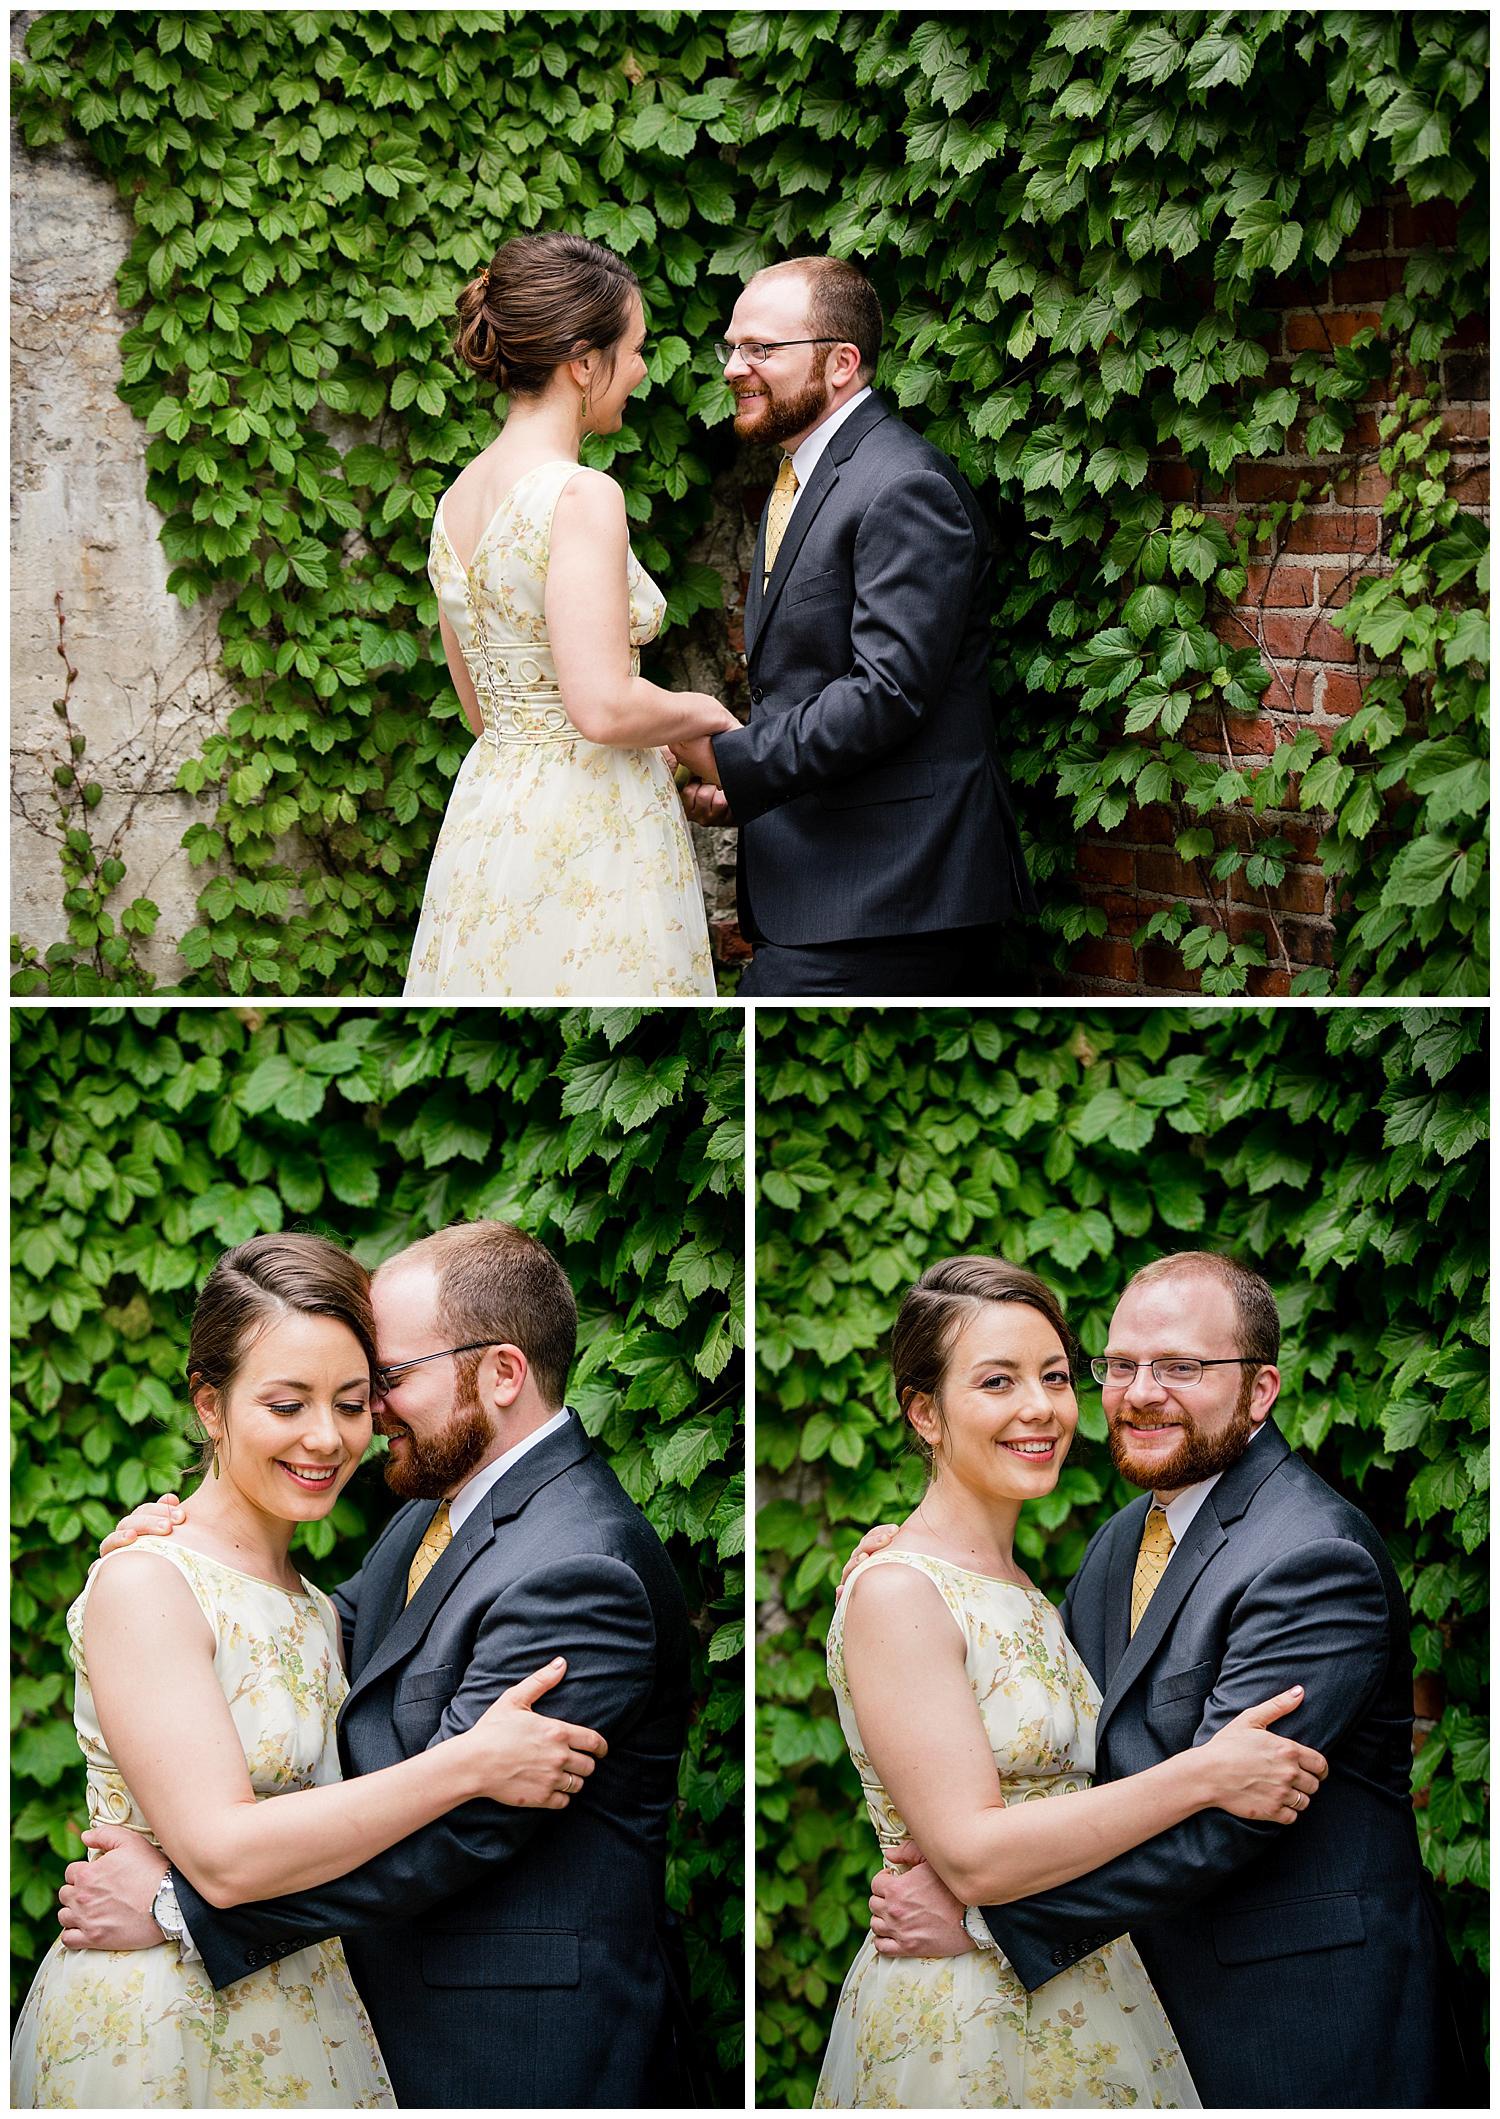 Lynn-Musuem-Wedding-Boston-Photographer-26-North-Studios-014.jpg